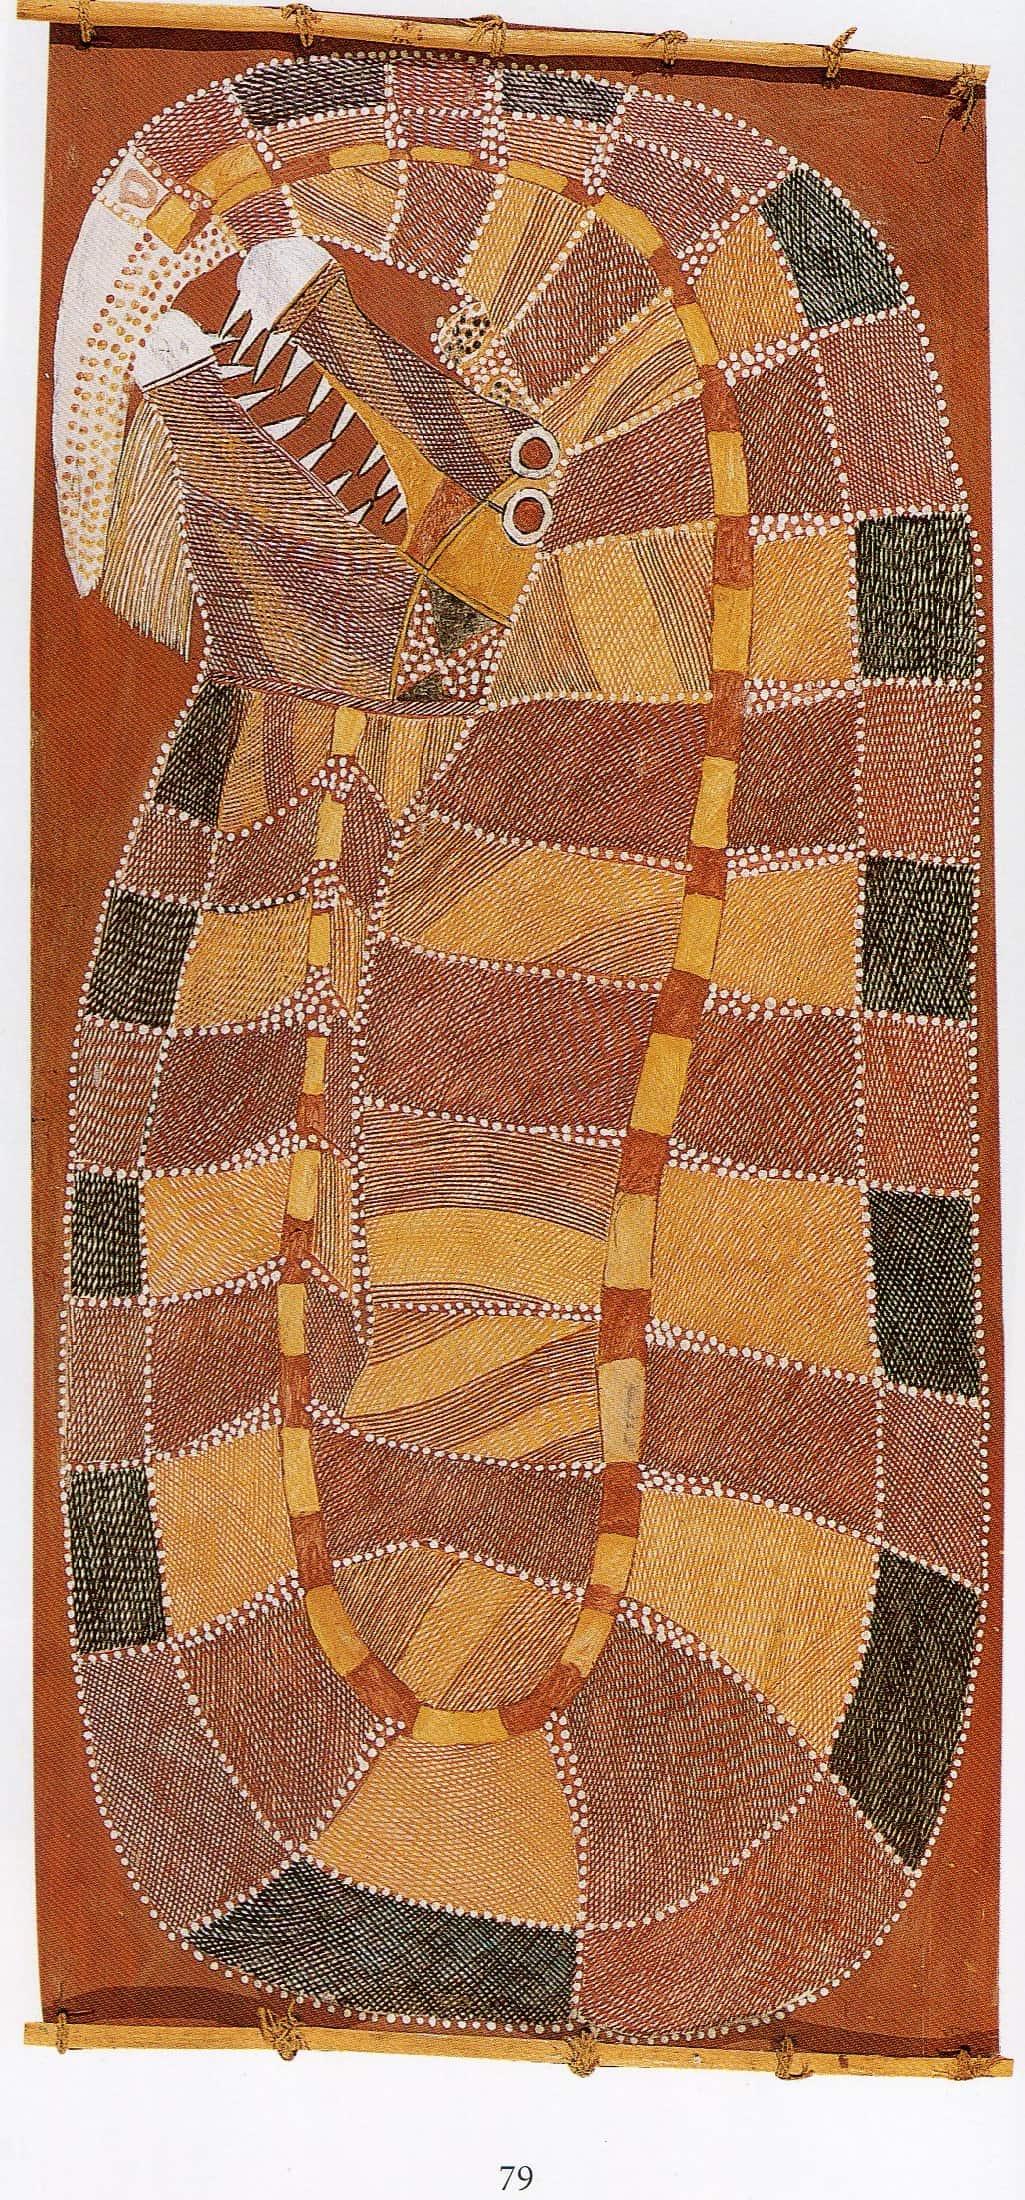 Peter marralwanga Rainbow serpents